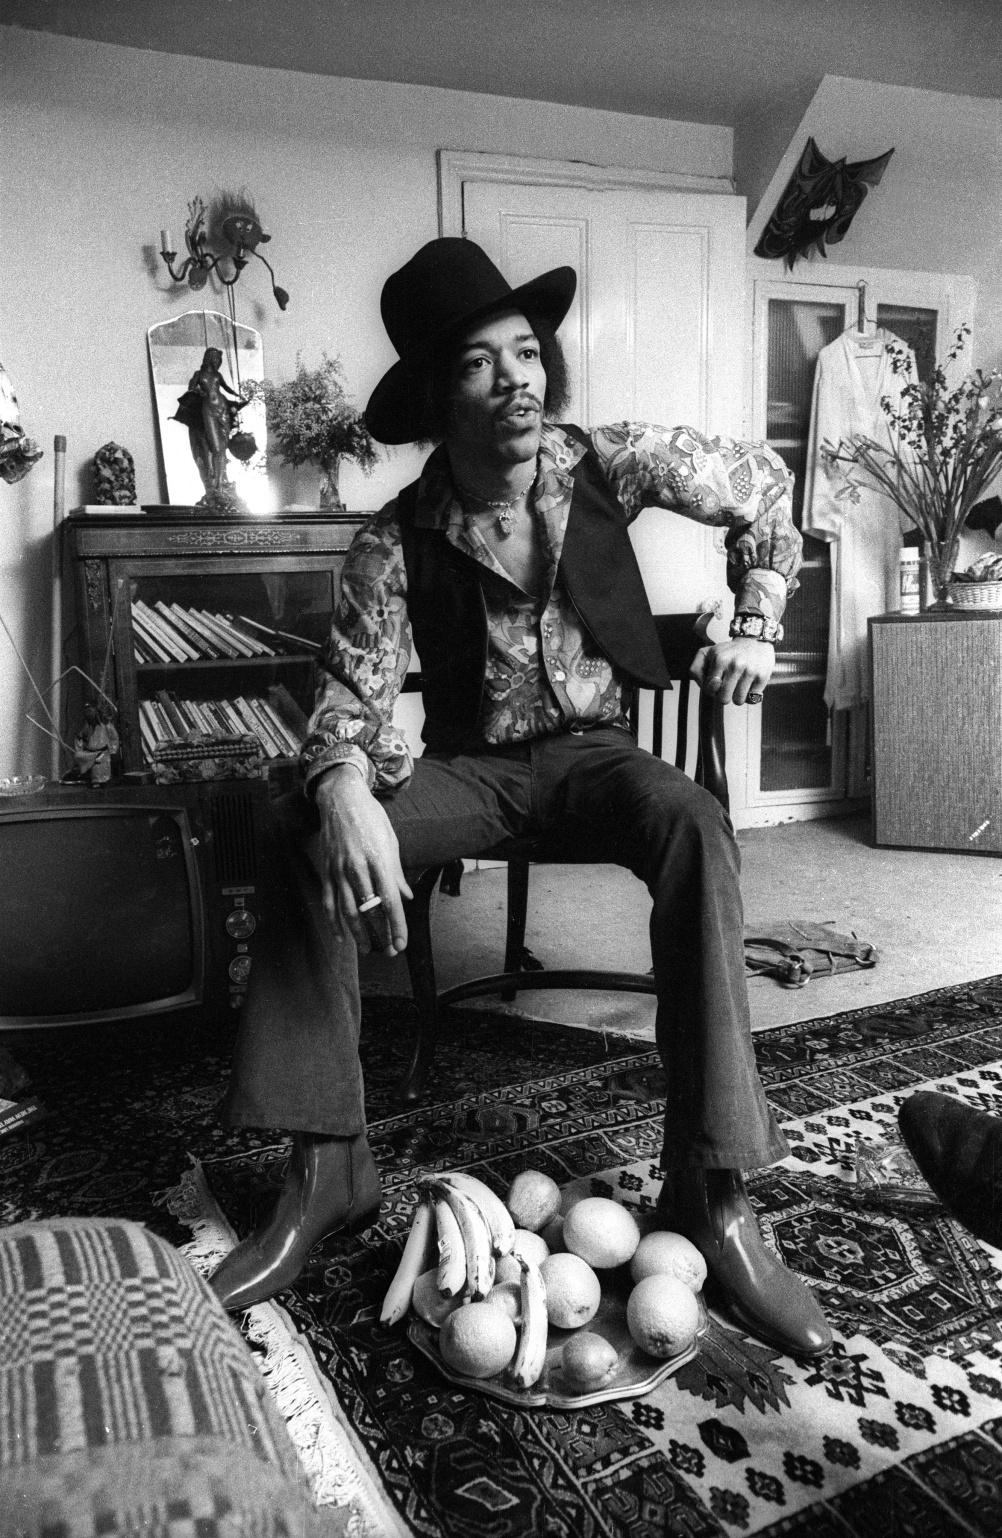 384A_8. Jimi Hendrix at 23 Brook Street, 1969. Credit (c)Barrie Wentzell